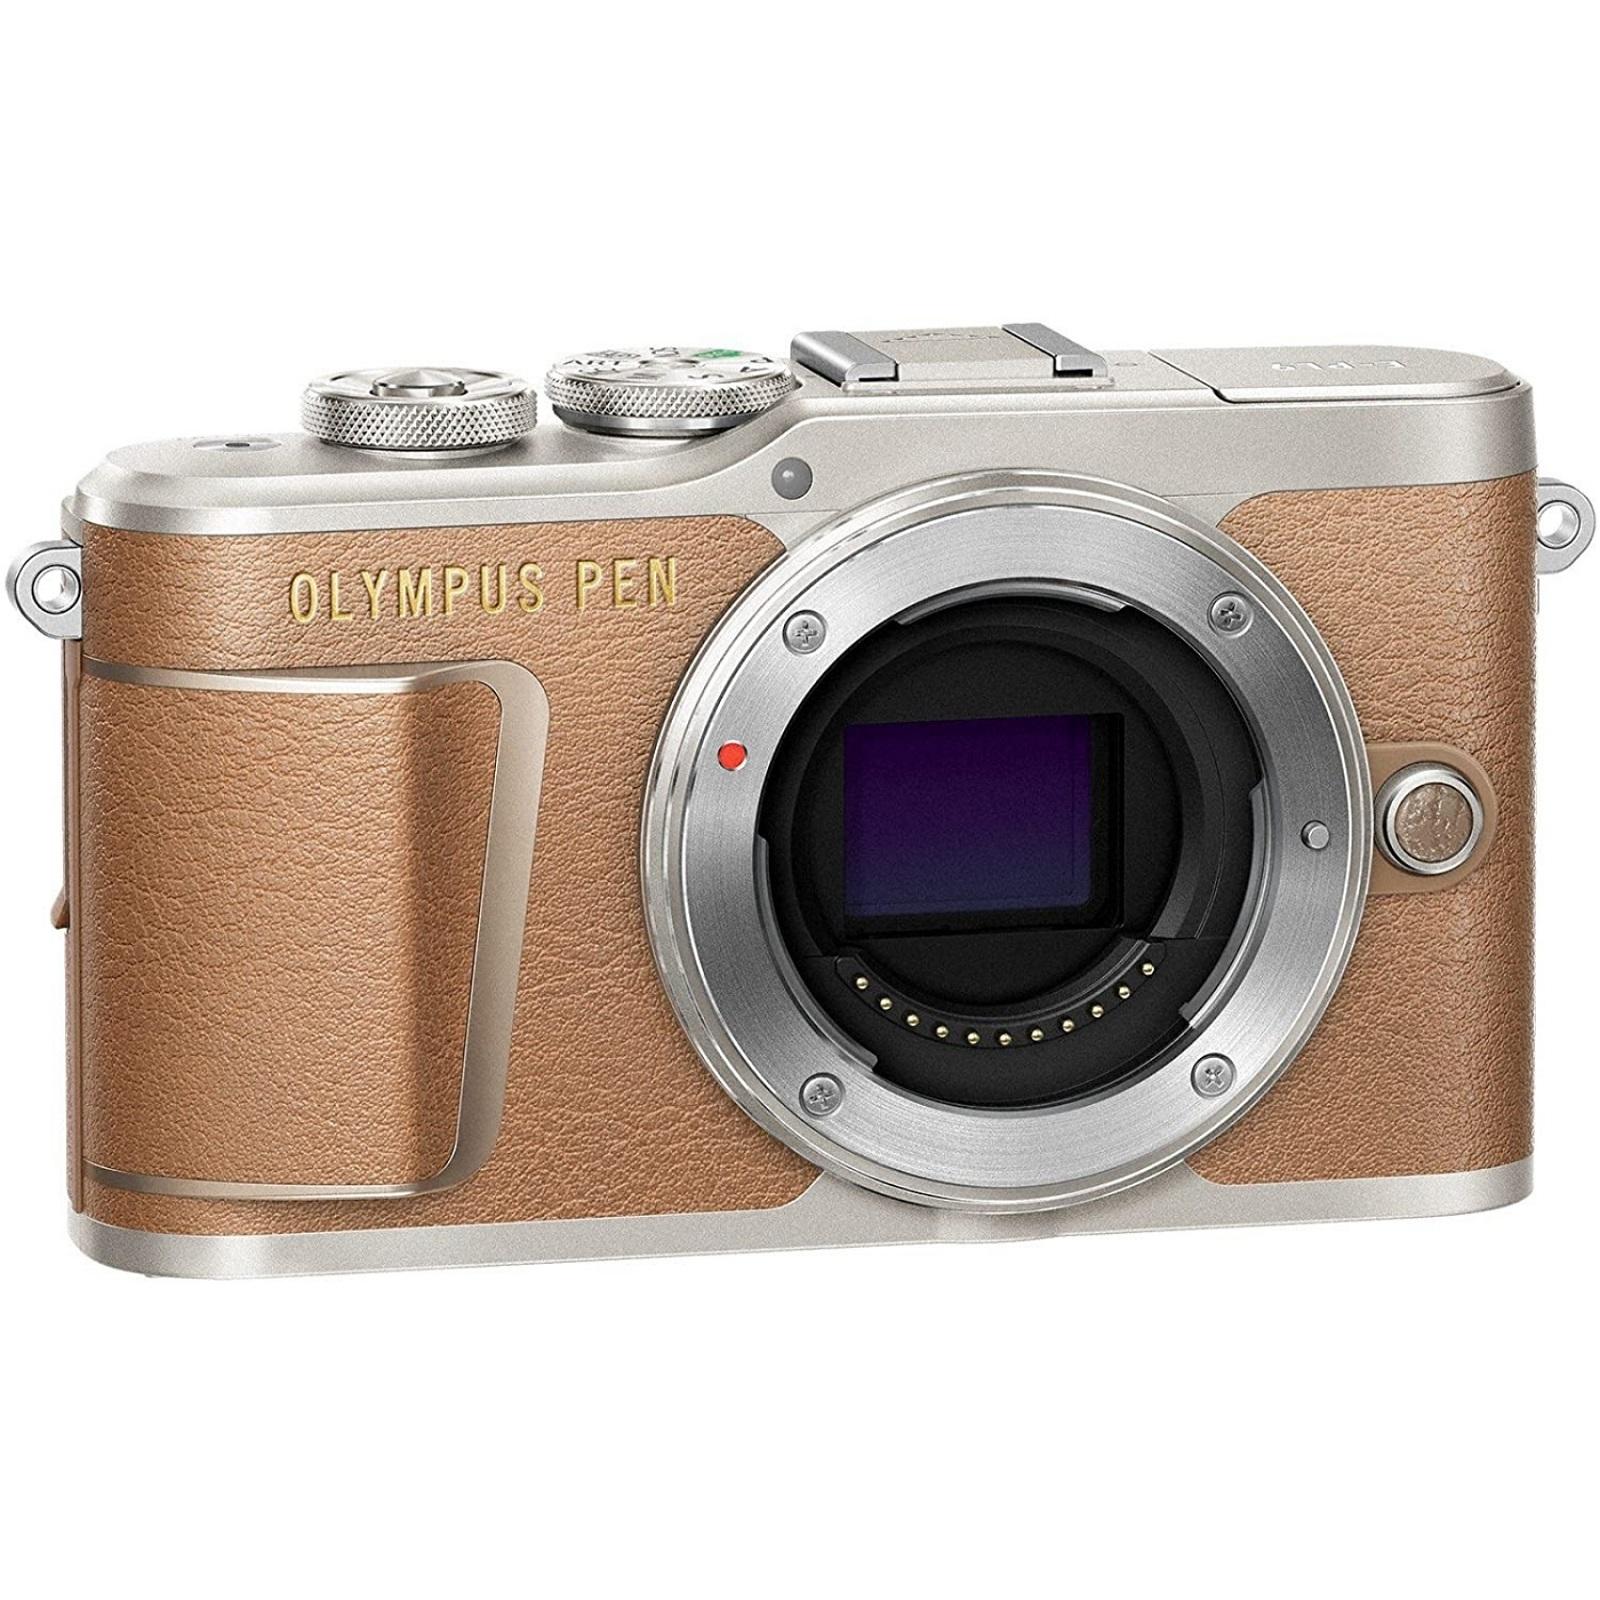 OLYMPUS オリンパス ミラーレス一眼カメラ PEN E-PL9 ボディー ブラウン 新品